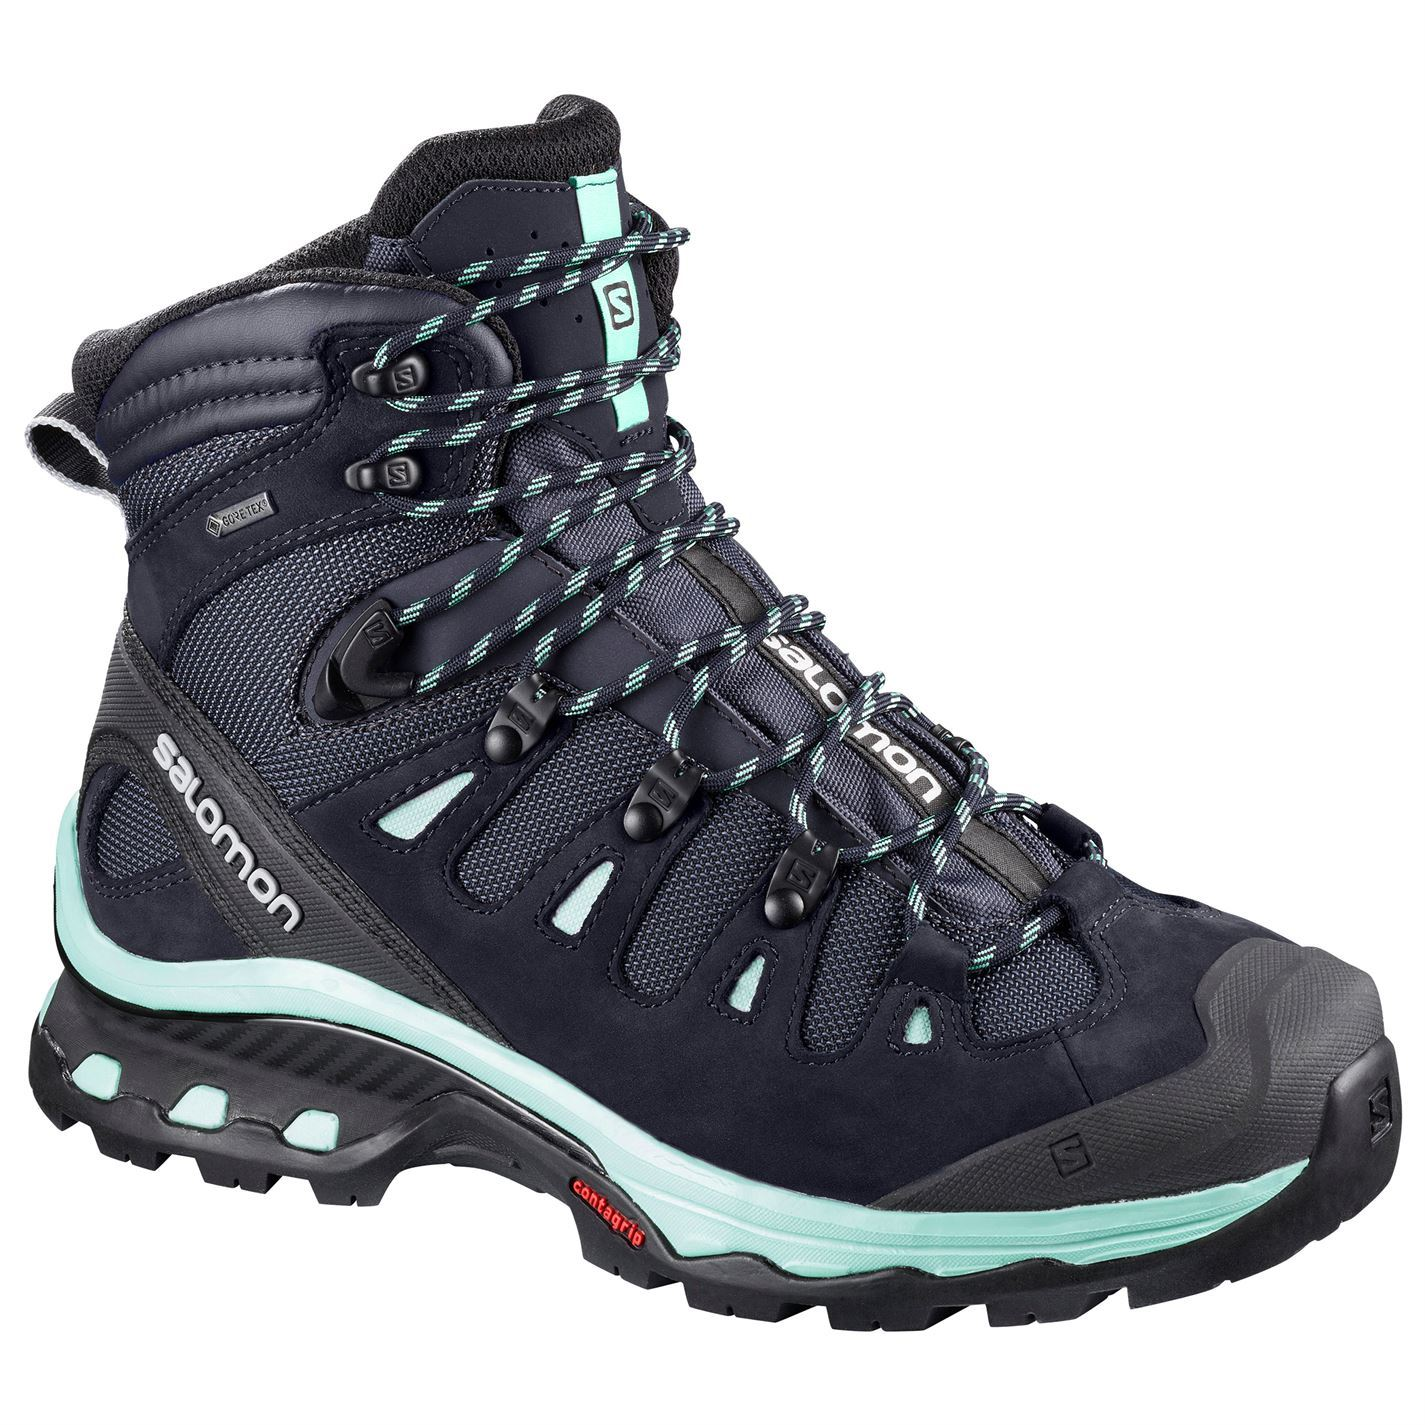 247bceb3 Details about Salomon Quest 4D 3 GTX Walking Boots Womens Blue Hiking  Trekking Shoes Footwear